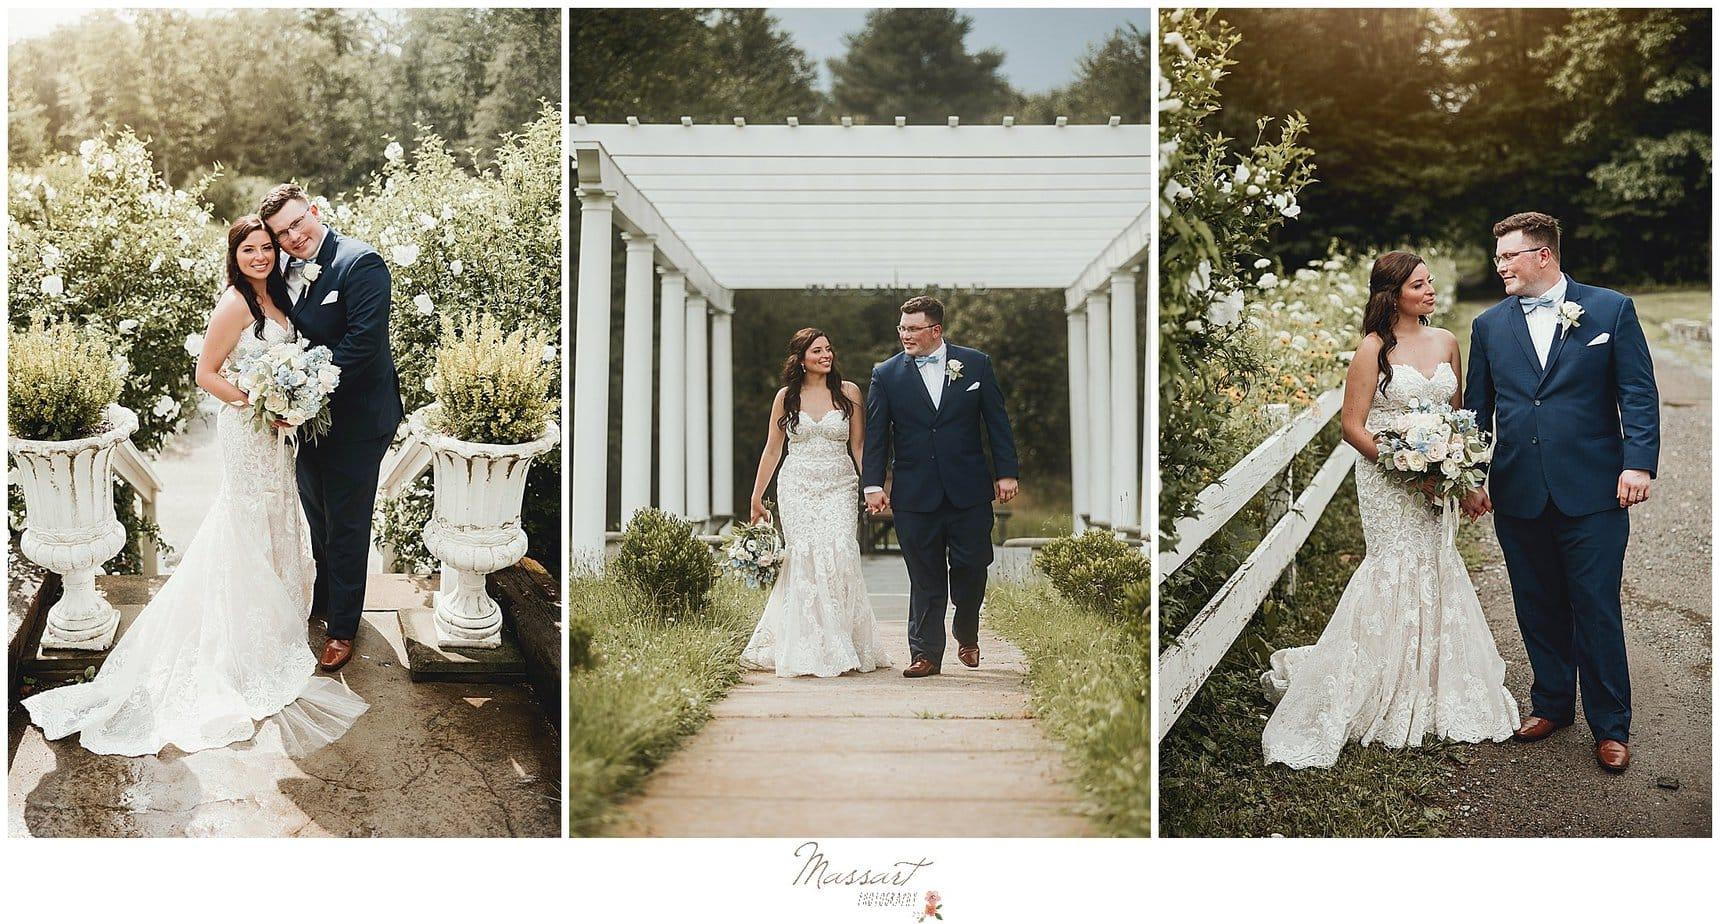 Massart Photographers photograph a bride and groom at Five Bridge Inn in MA